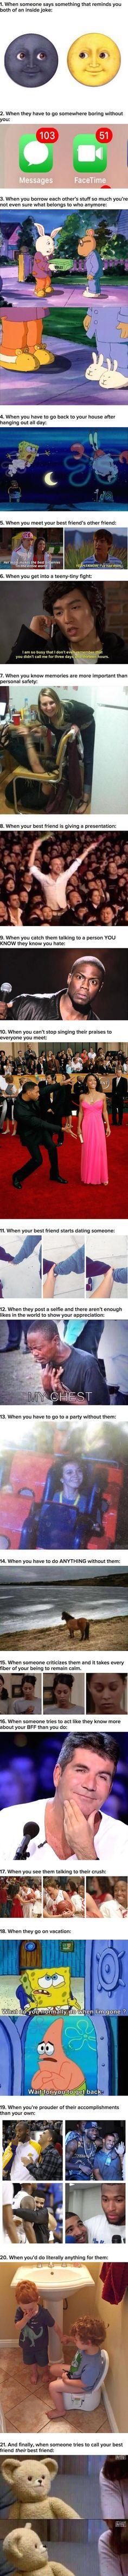 Best friends will know